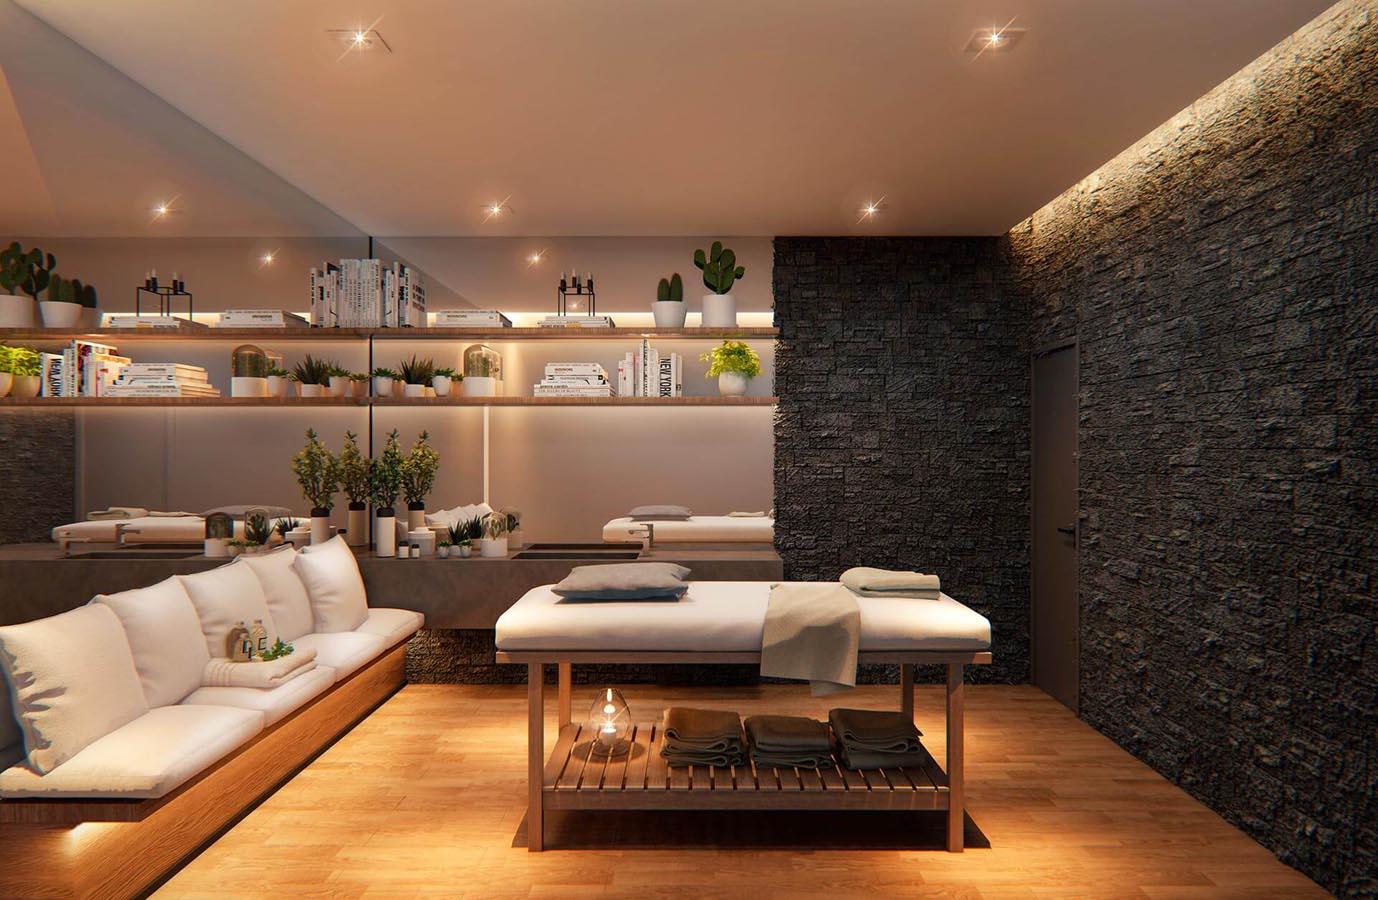 Perspectiva ilustrada da sala de massagem.